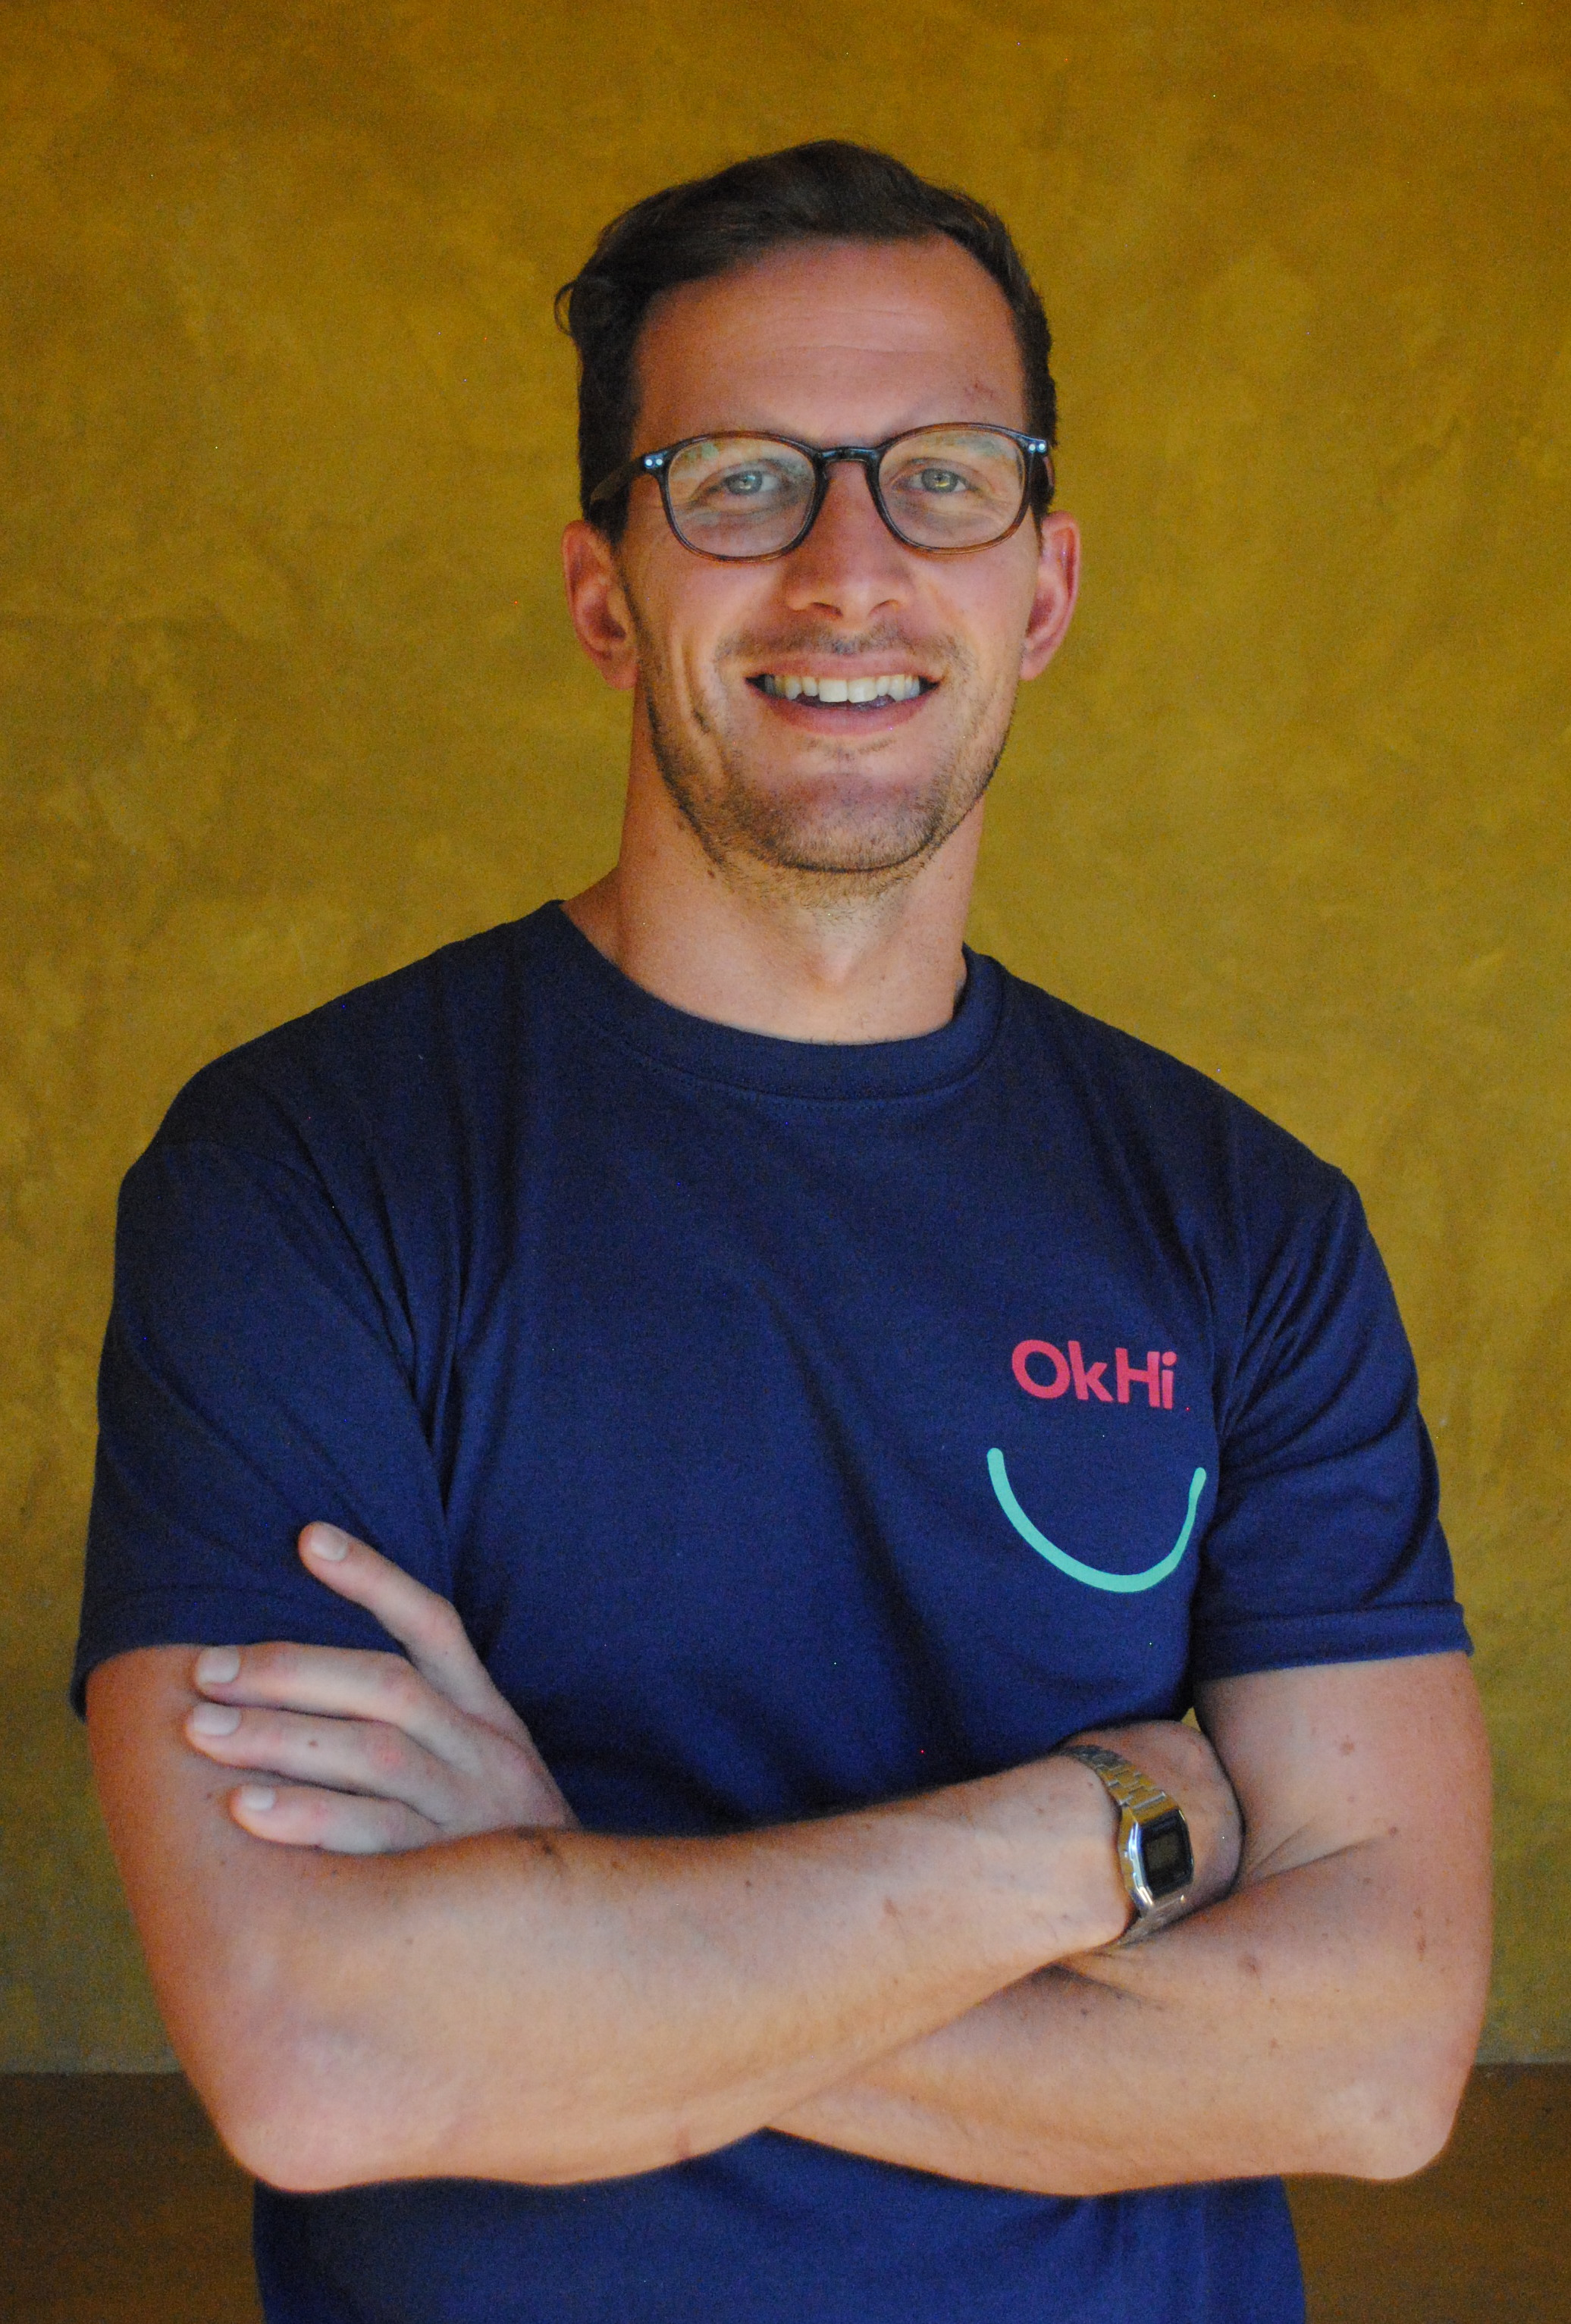 10 Things To Know About New Kenyan App OkHi – KenyaBuzz LifeStyle